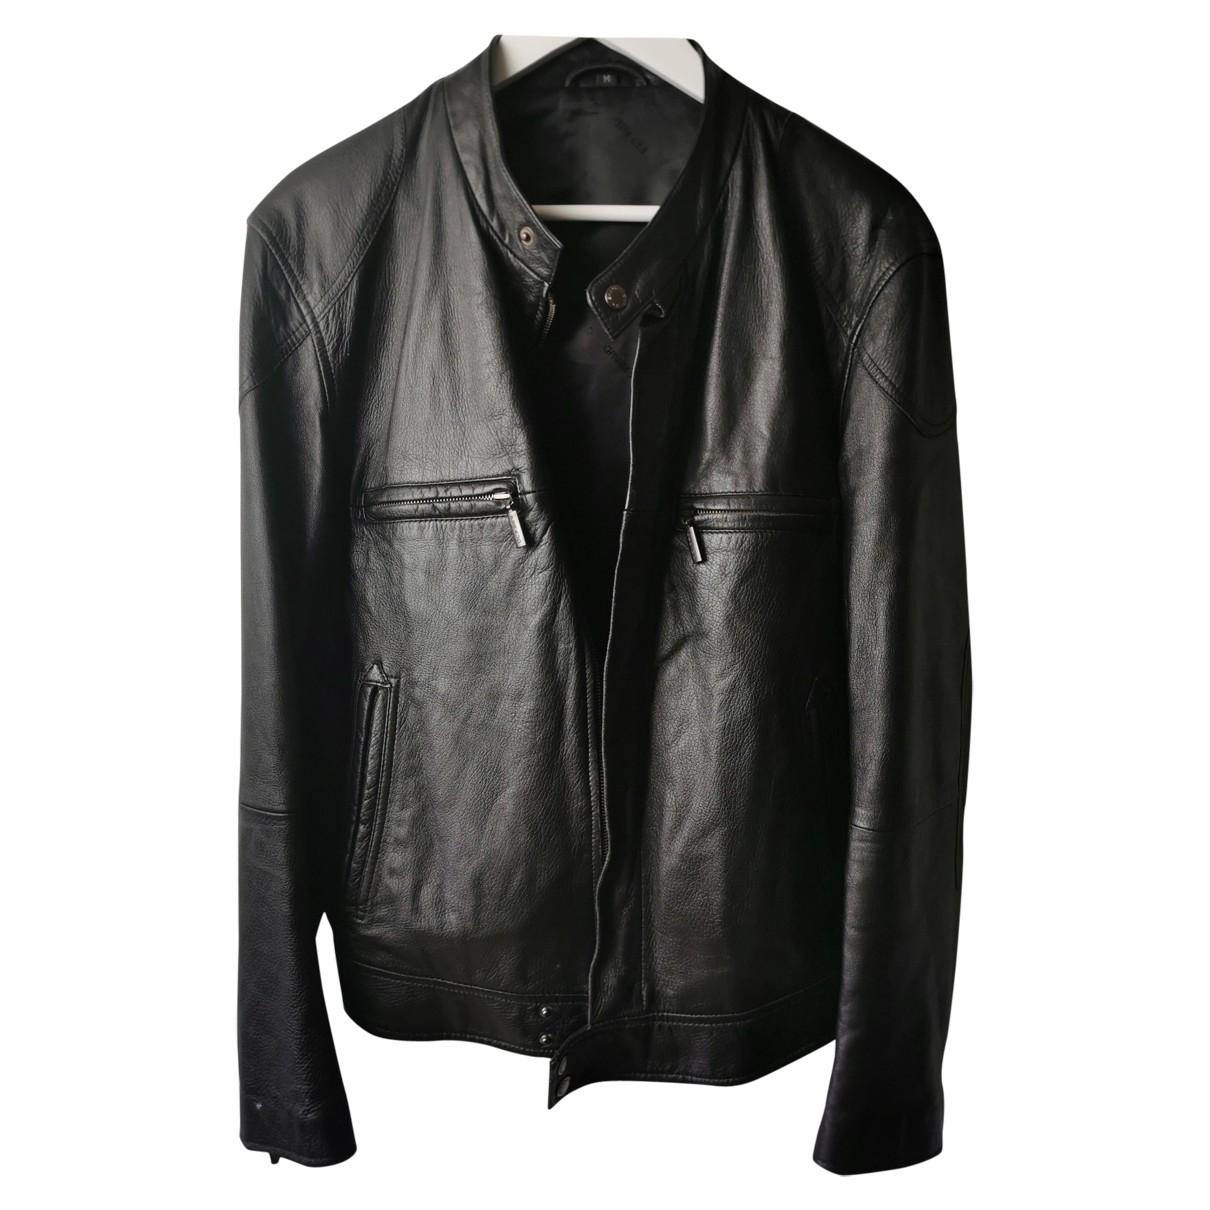 Louis Feraud \N Black Leather jacket  for Men M International